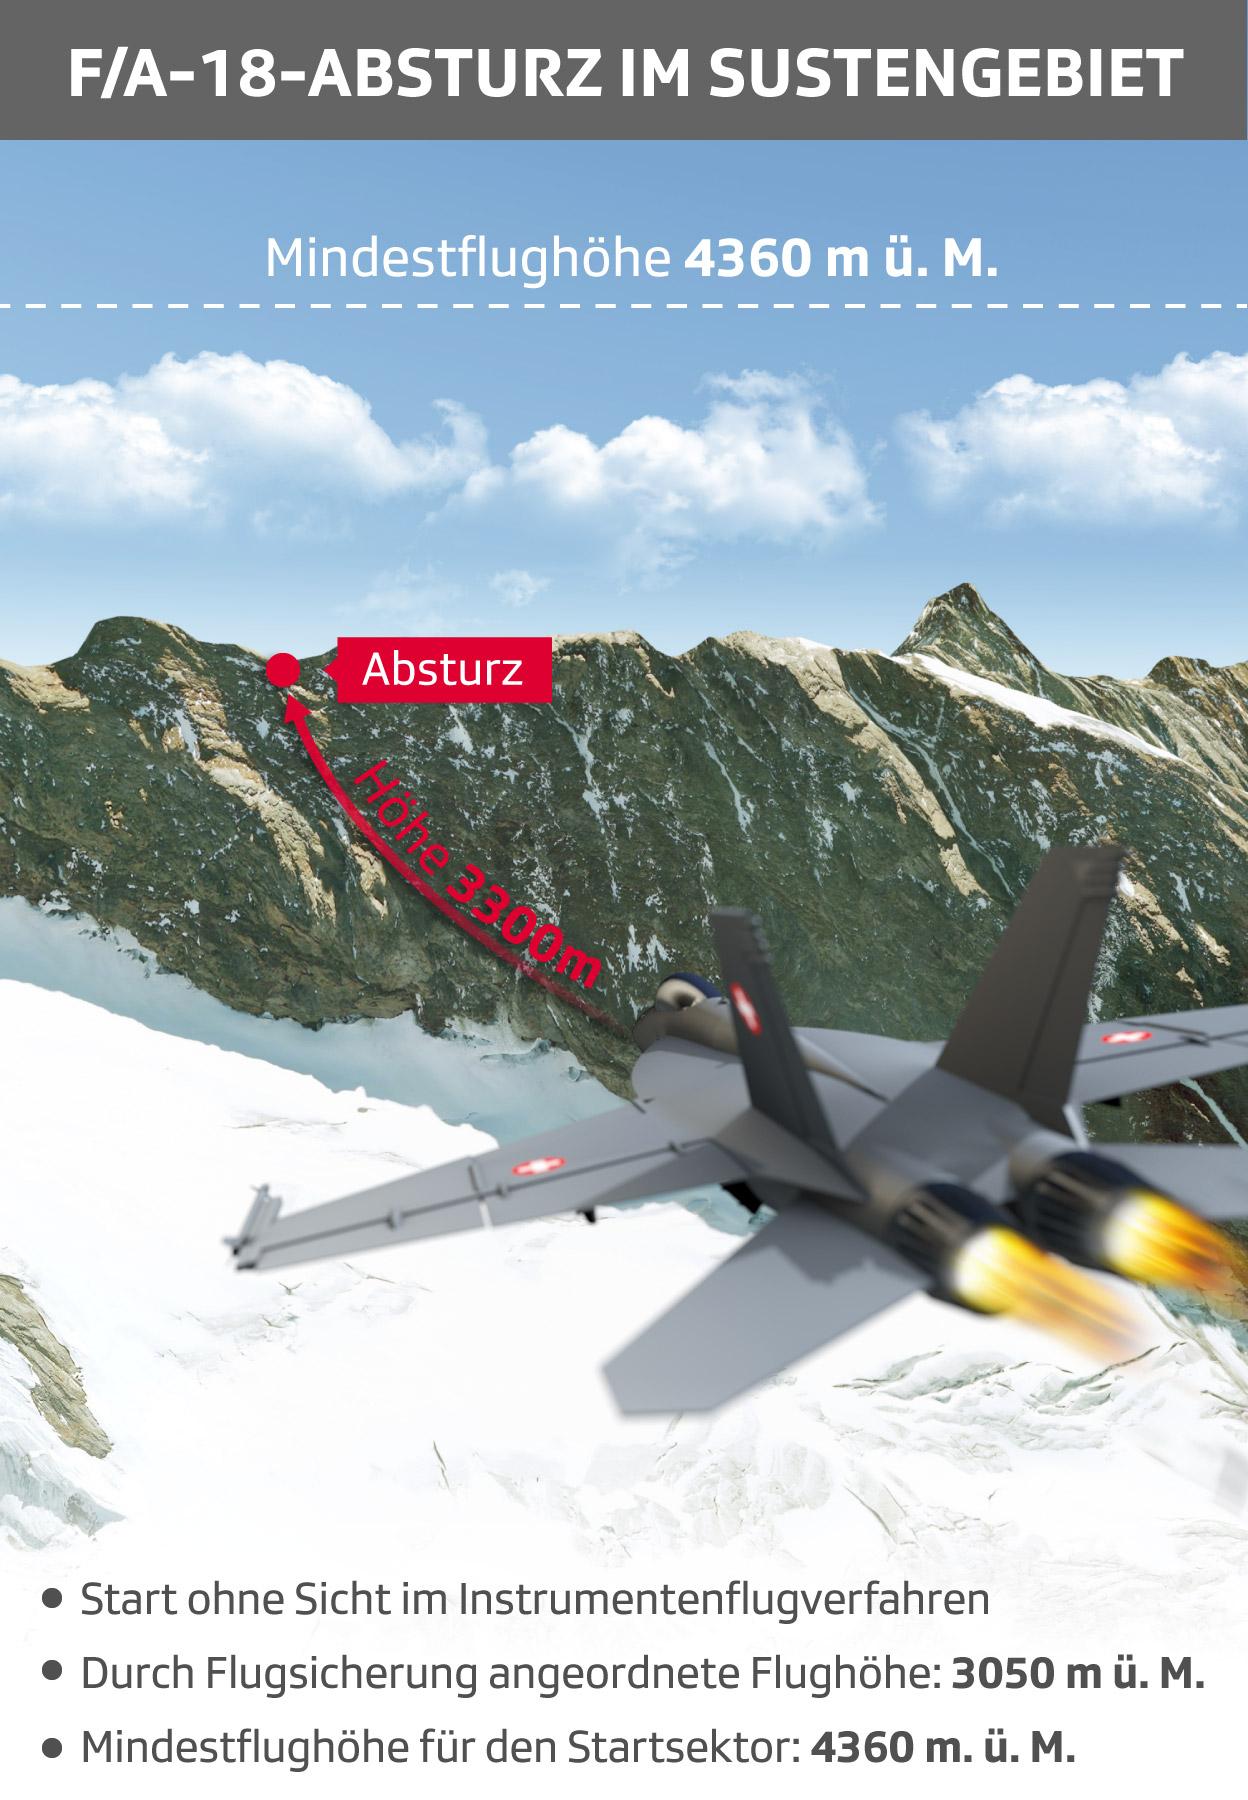 zu geringe Flughöhe vor dem F/A-18-Crash